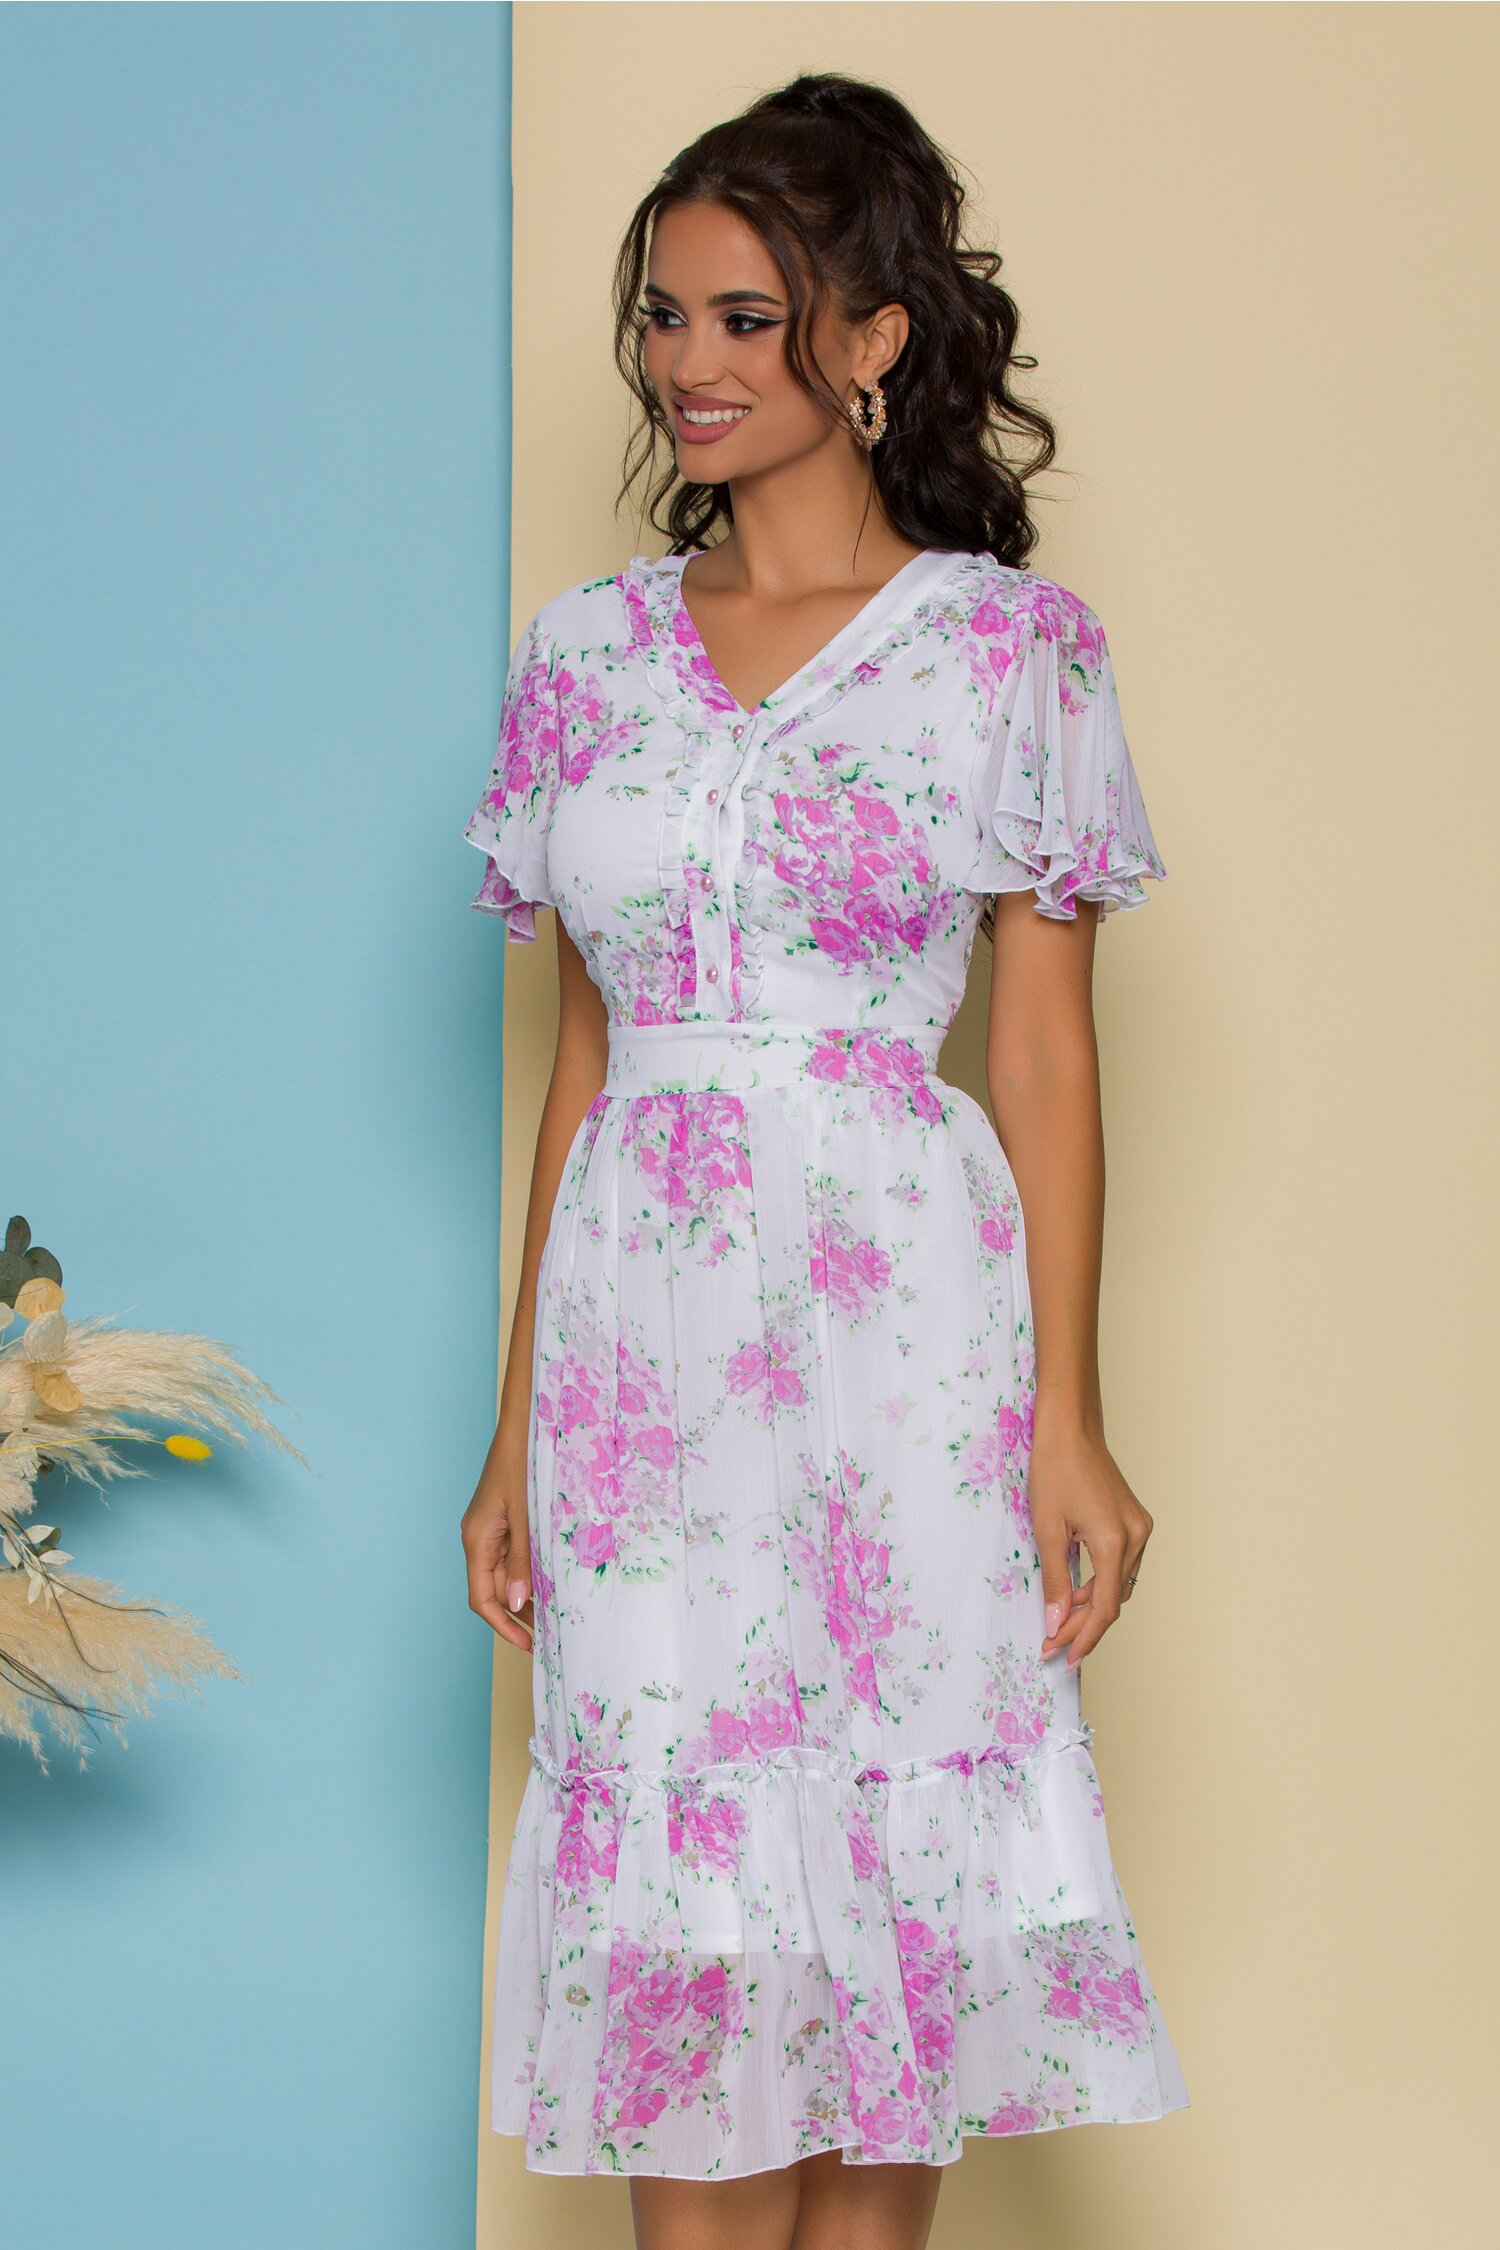 Rochie Sarah alba cu imprimeuri florale roz